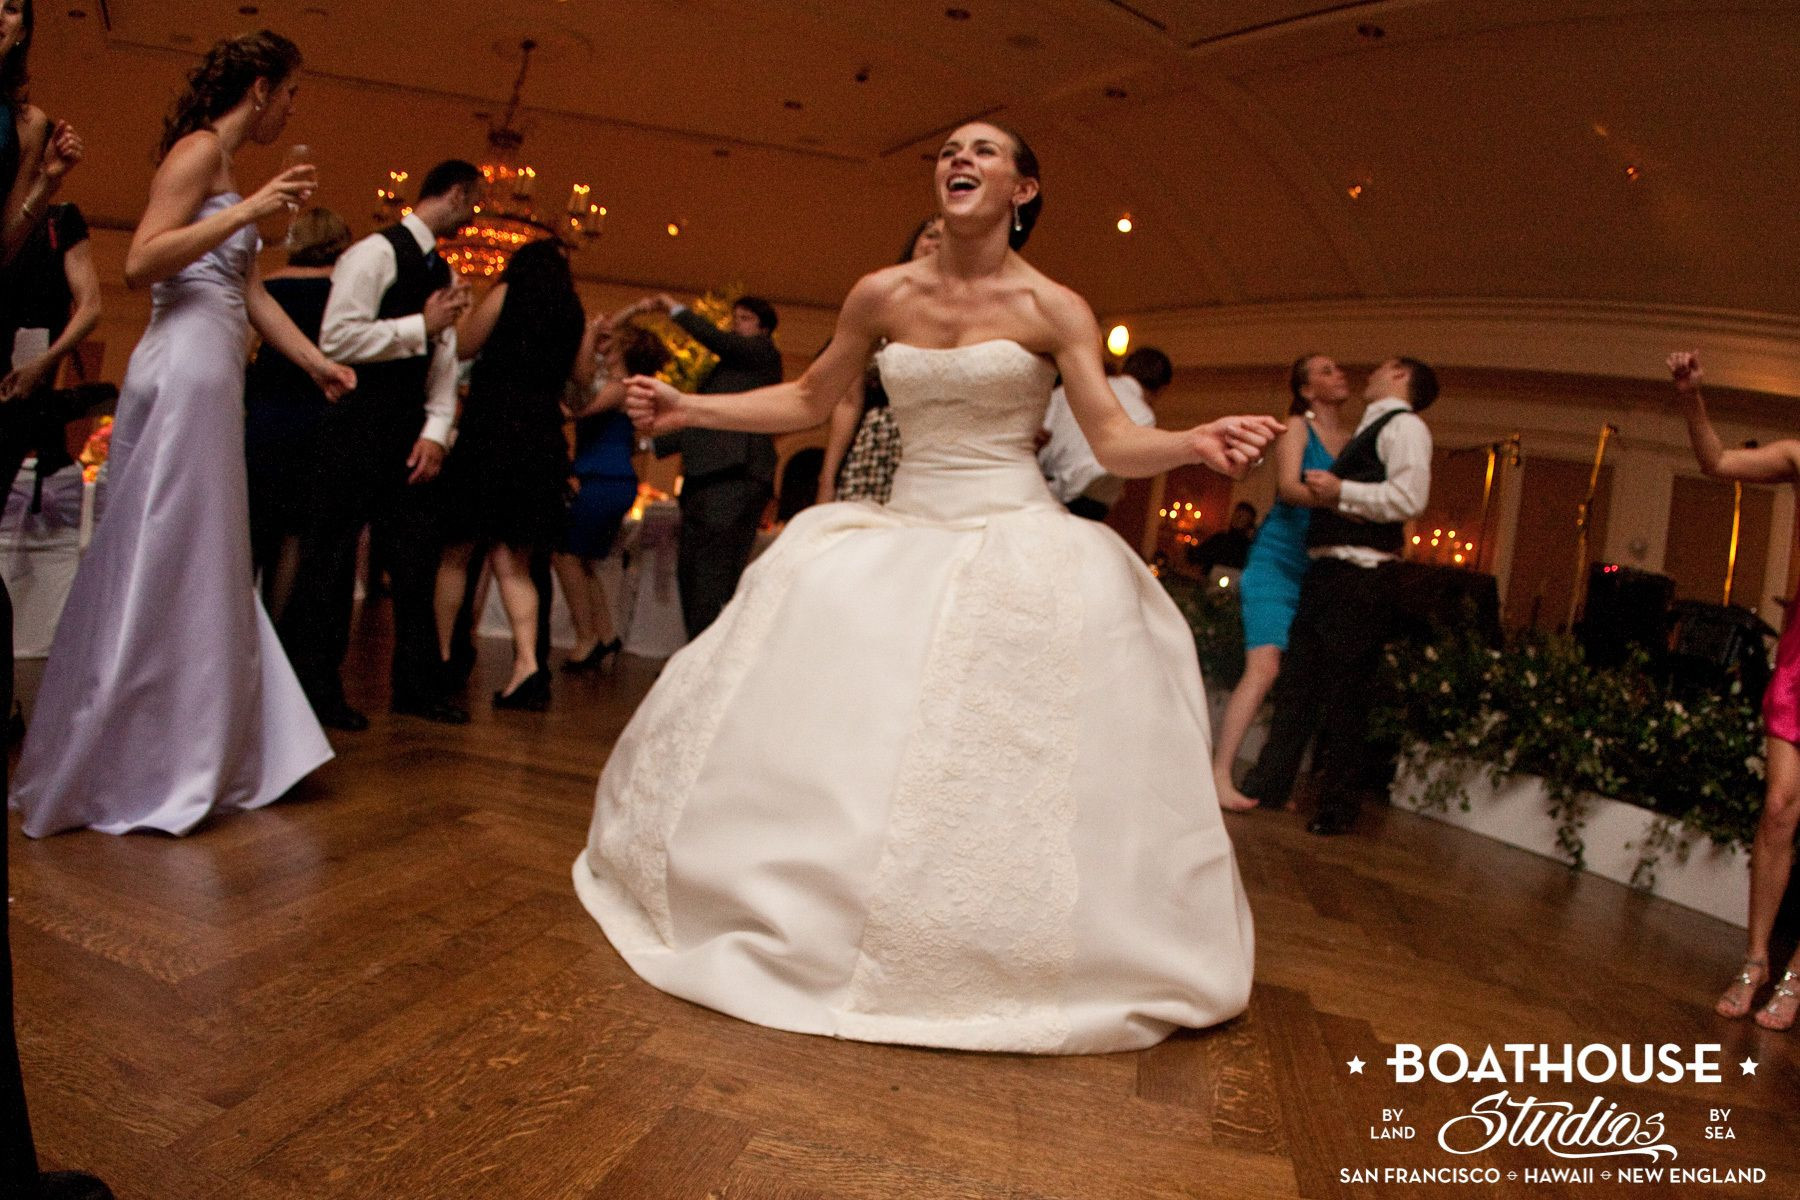 Lone Star State Wedding (Houston, TX)